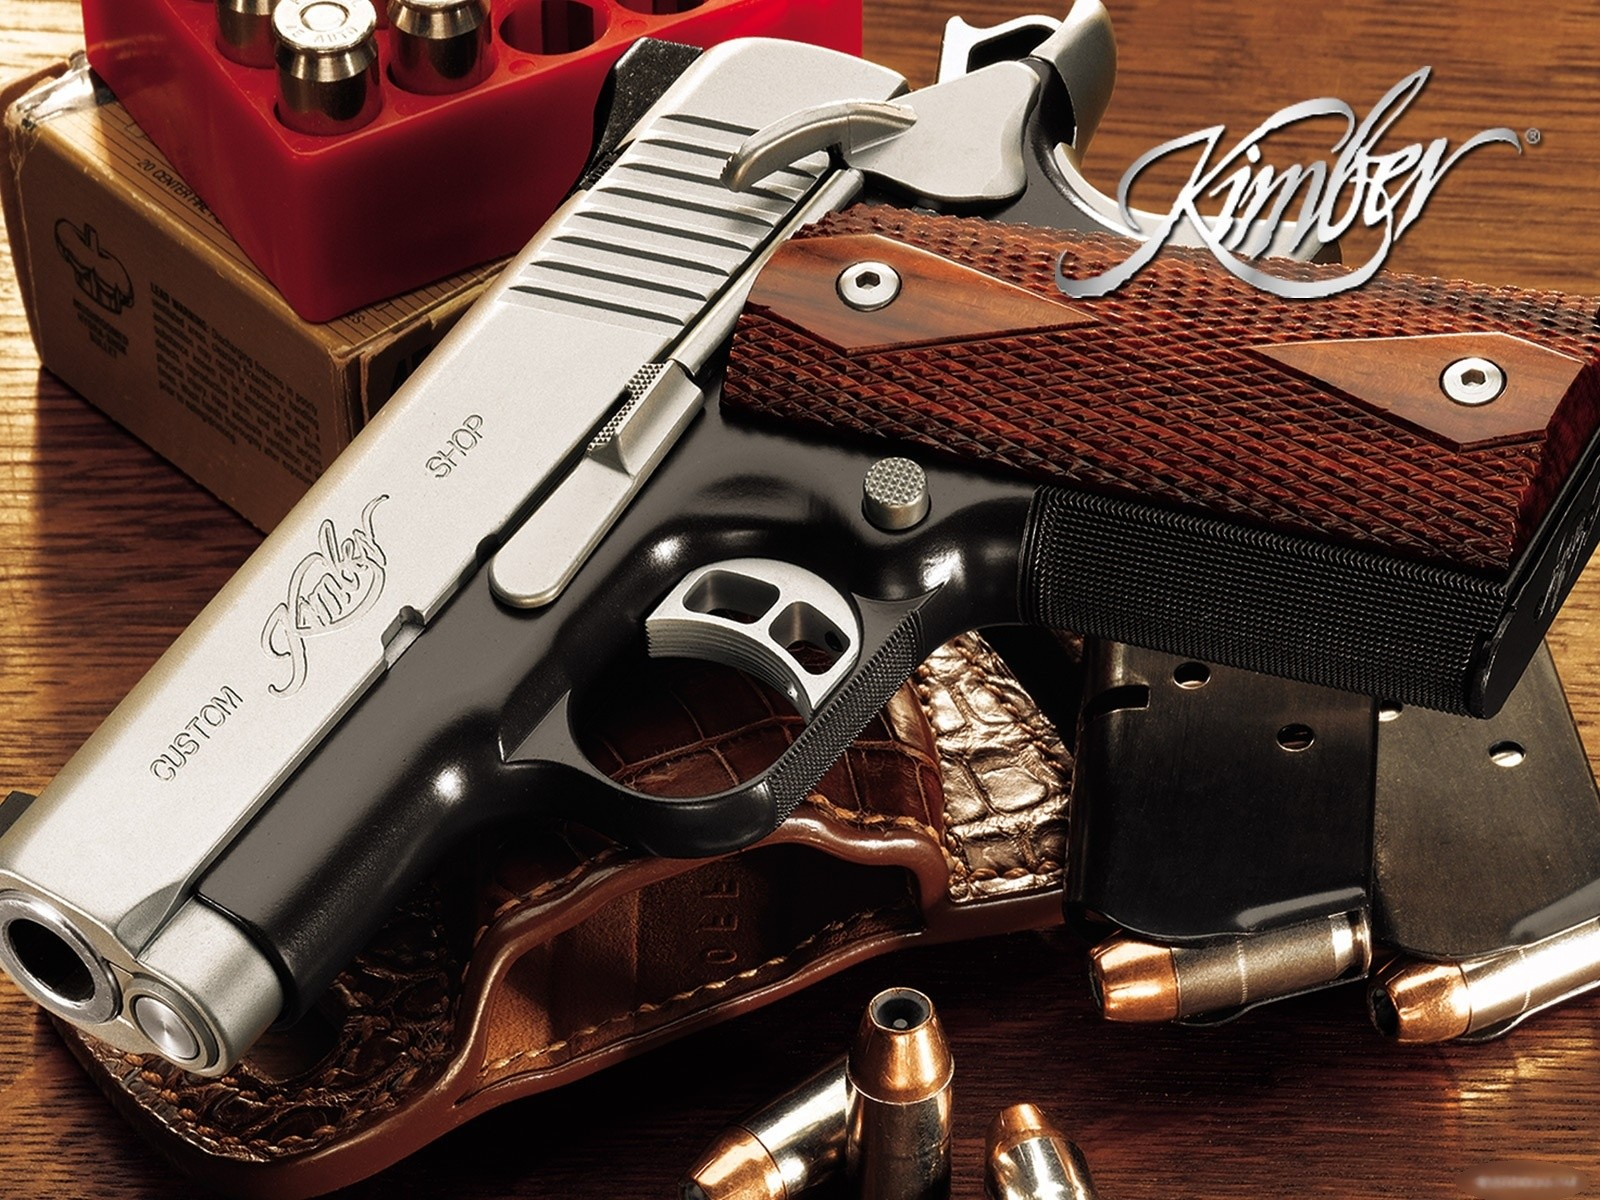 Weapons - Kimber Pistol Wallpaper